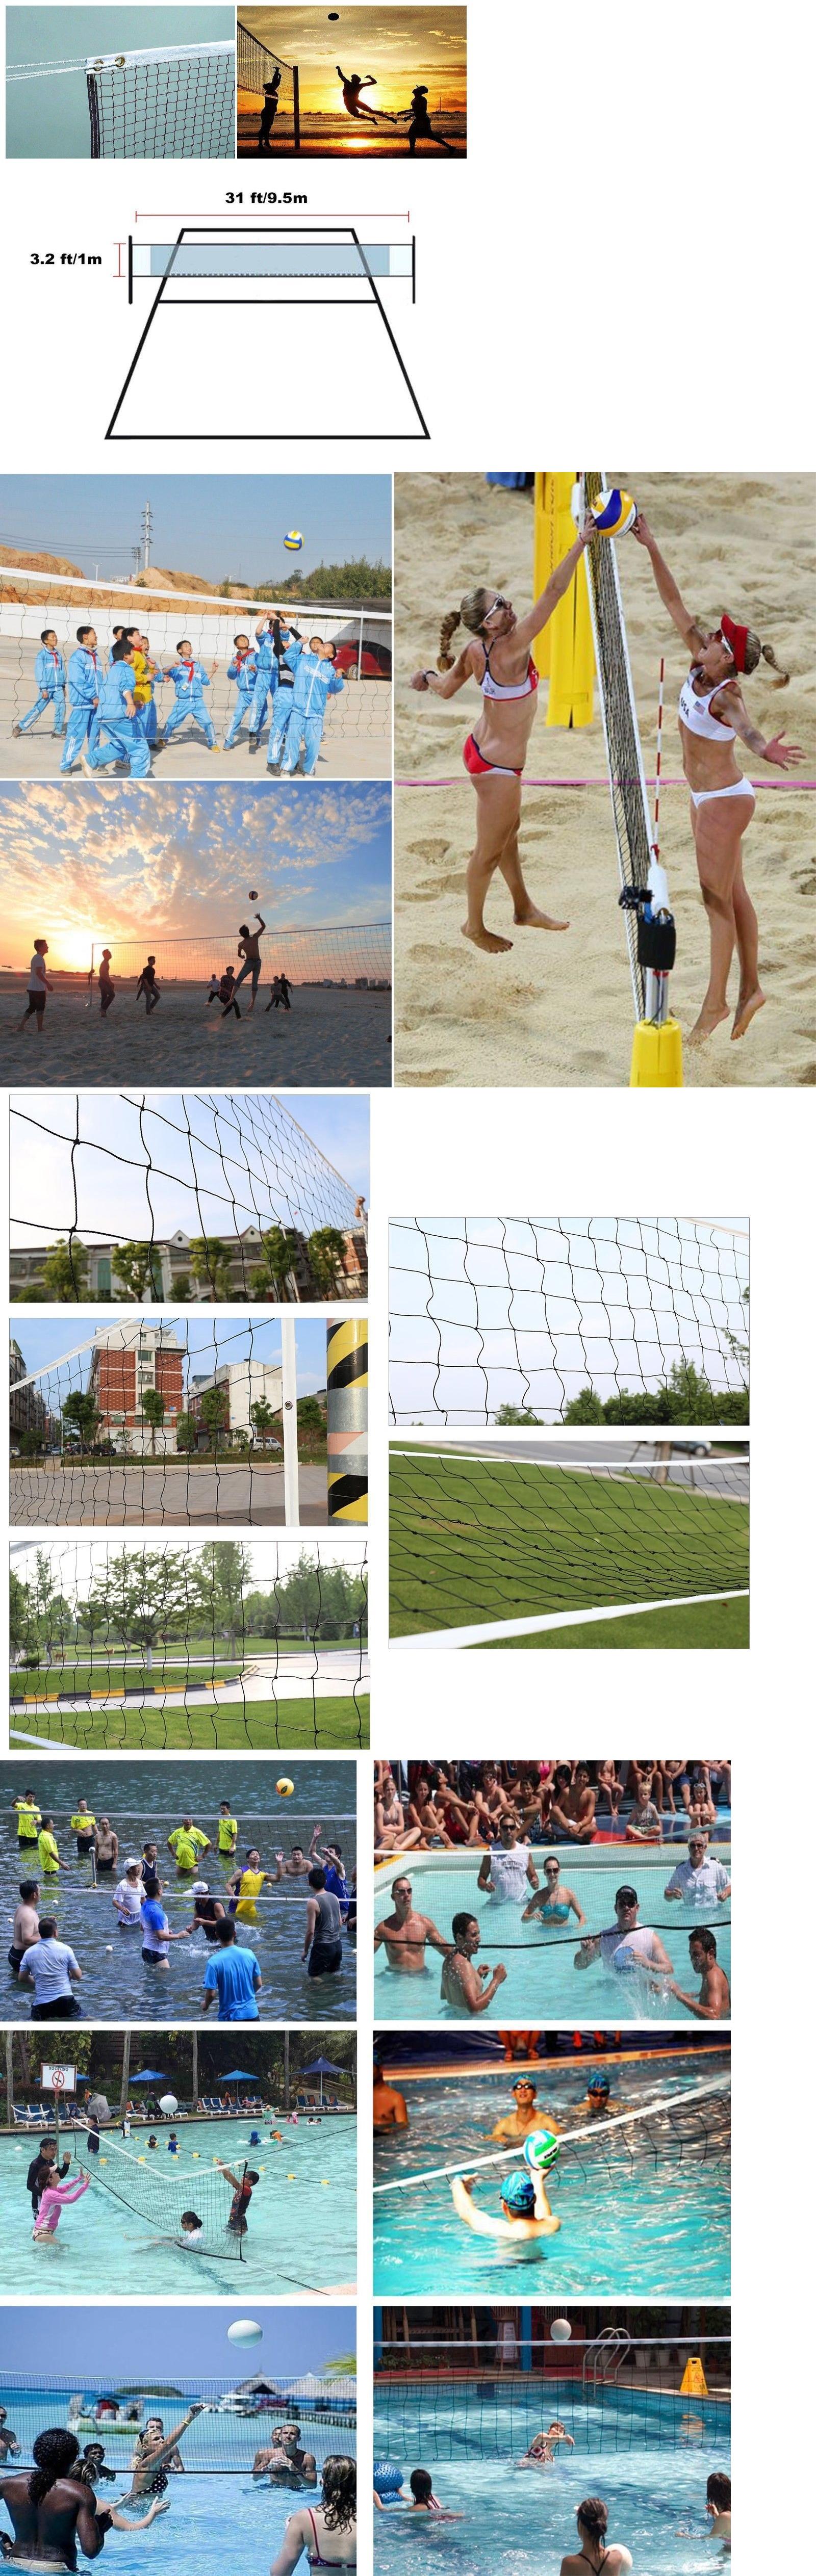 nets 159131 volleyball net professional backyard beach